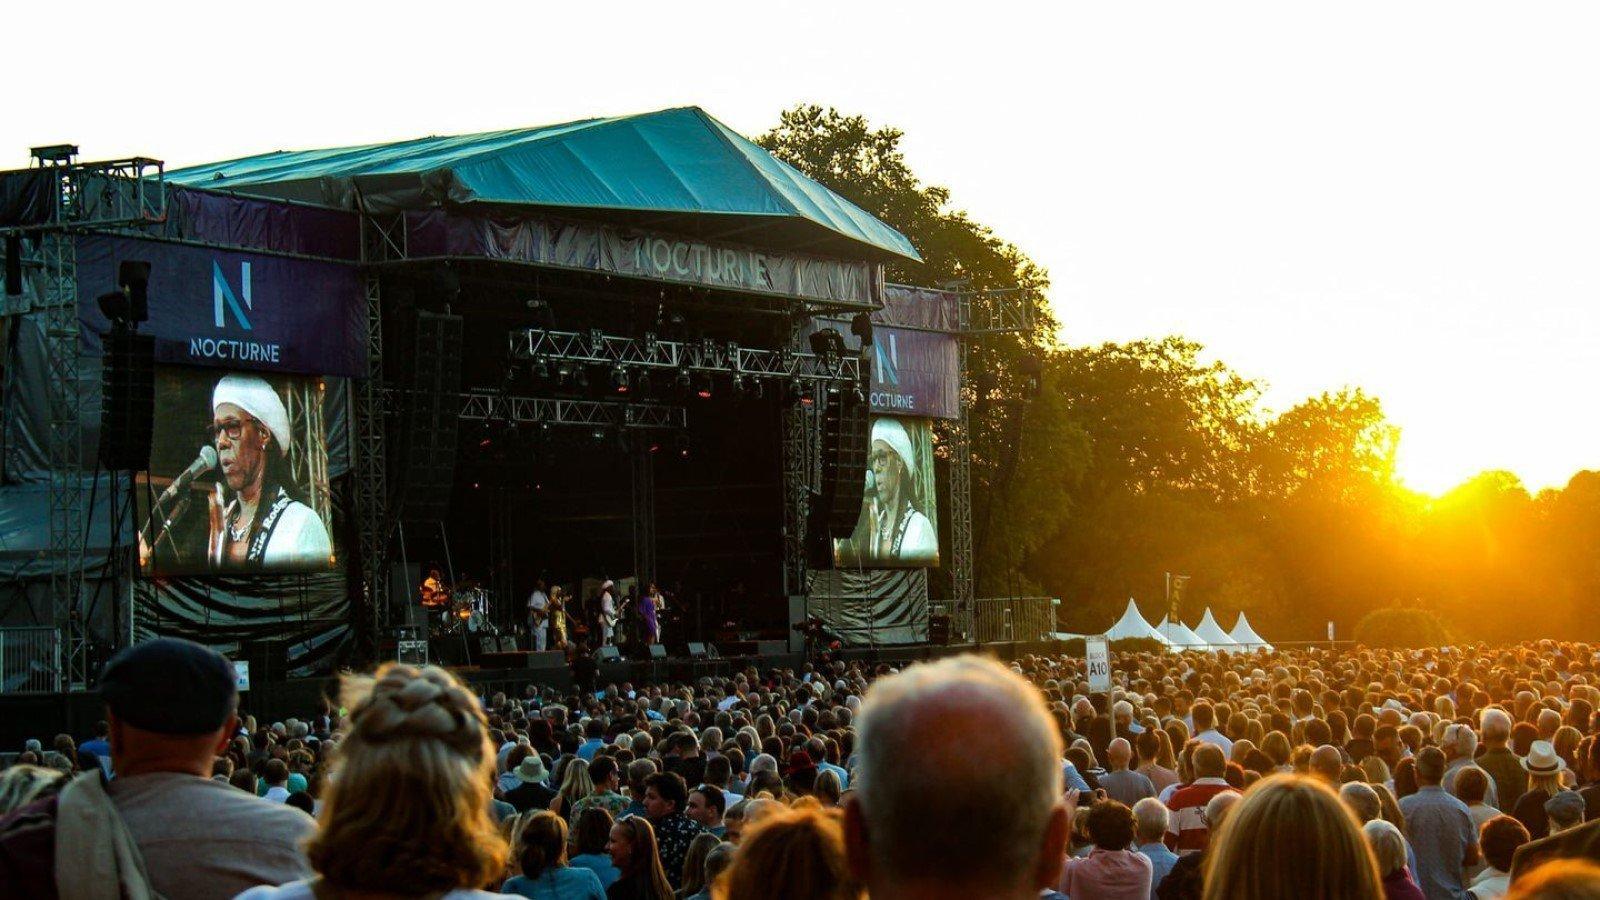 Nocturne Live 2022 at Blenheim Palace